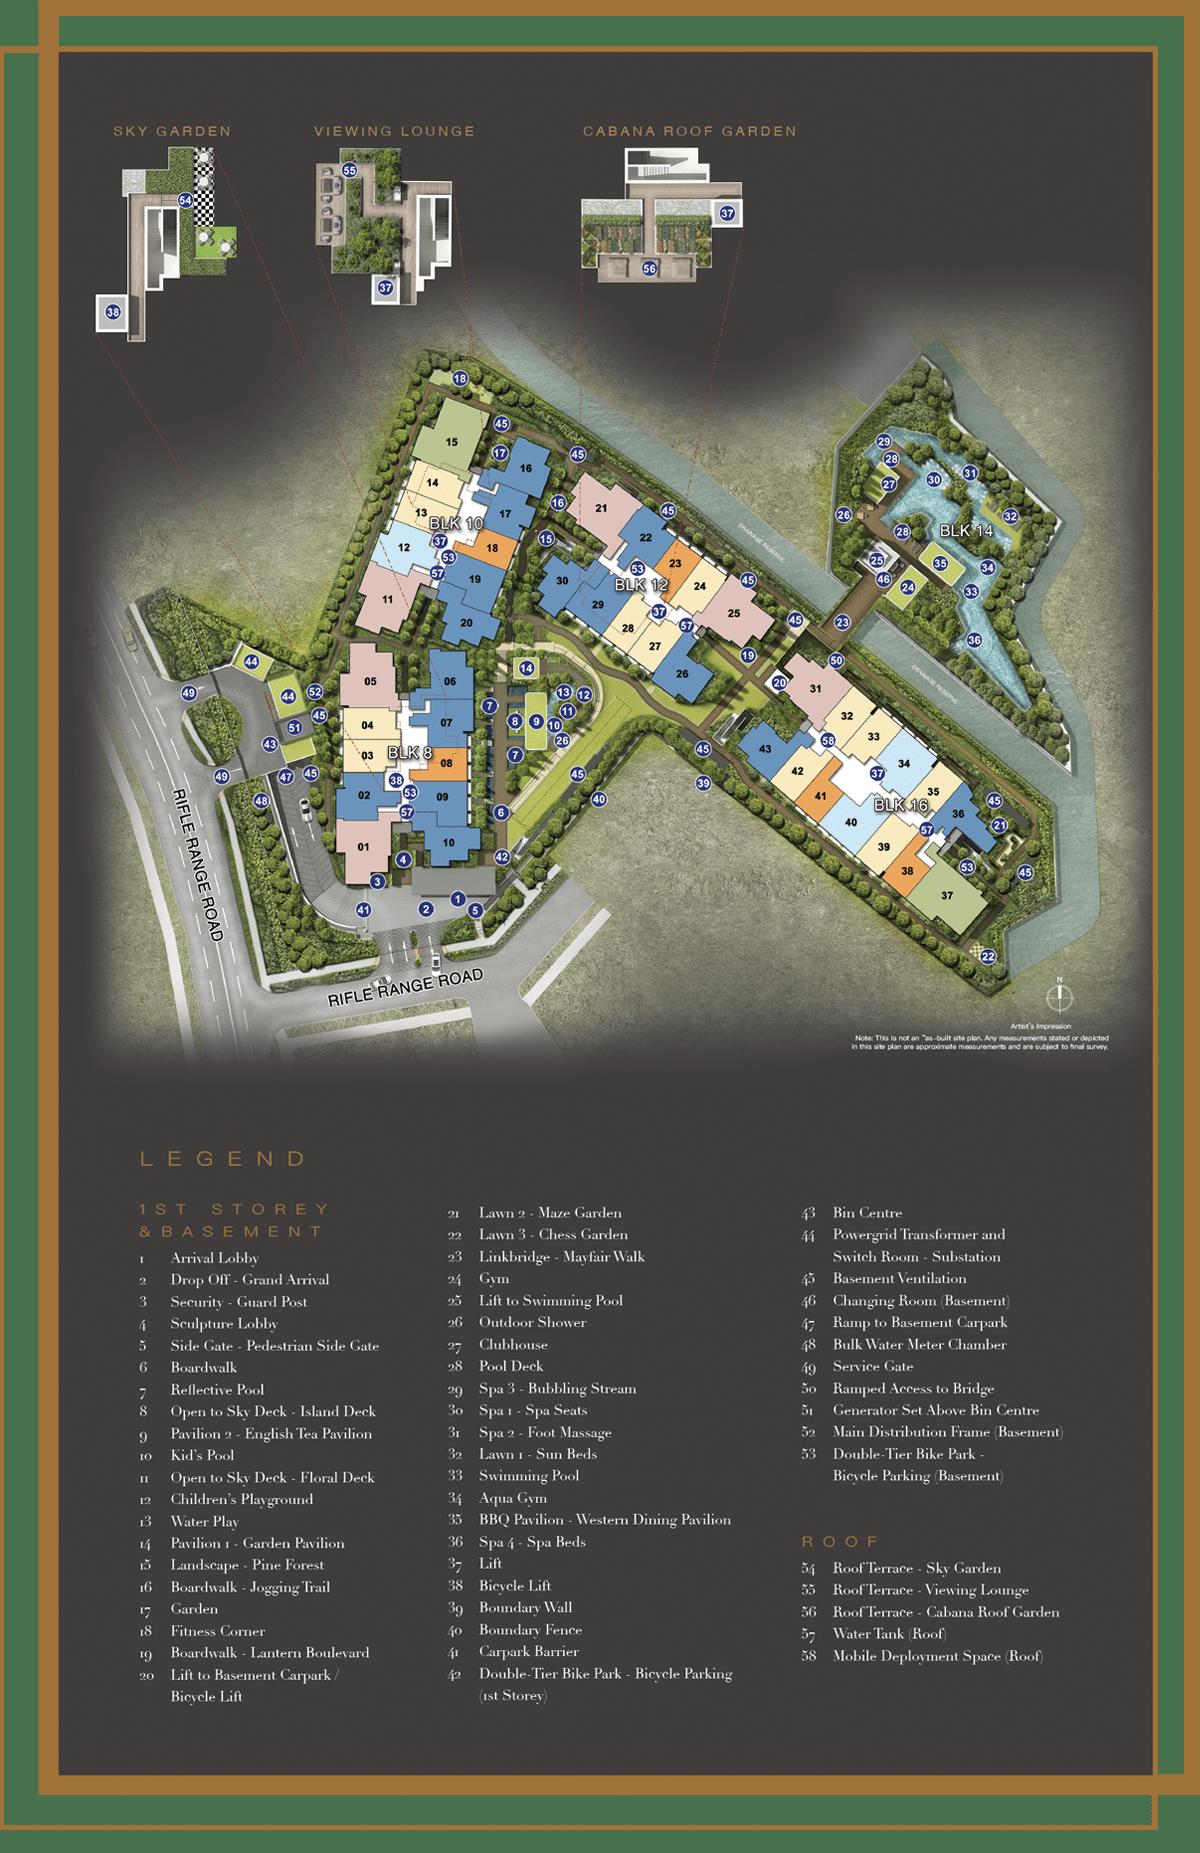 Mayfair Gardens Facilities